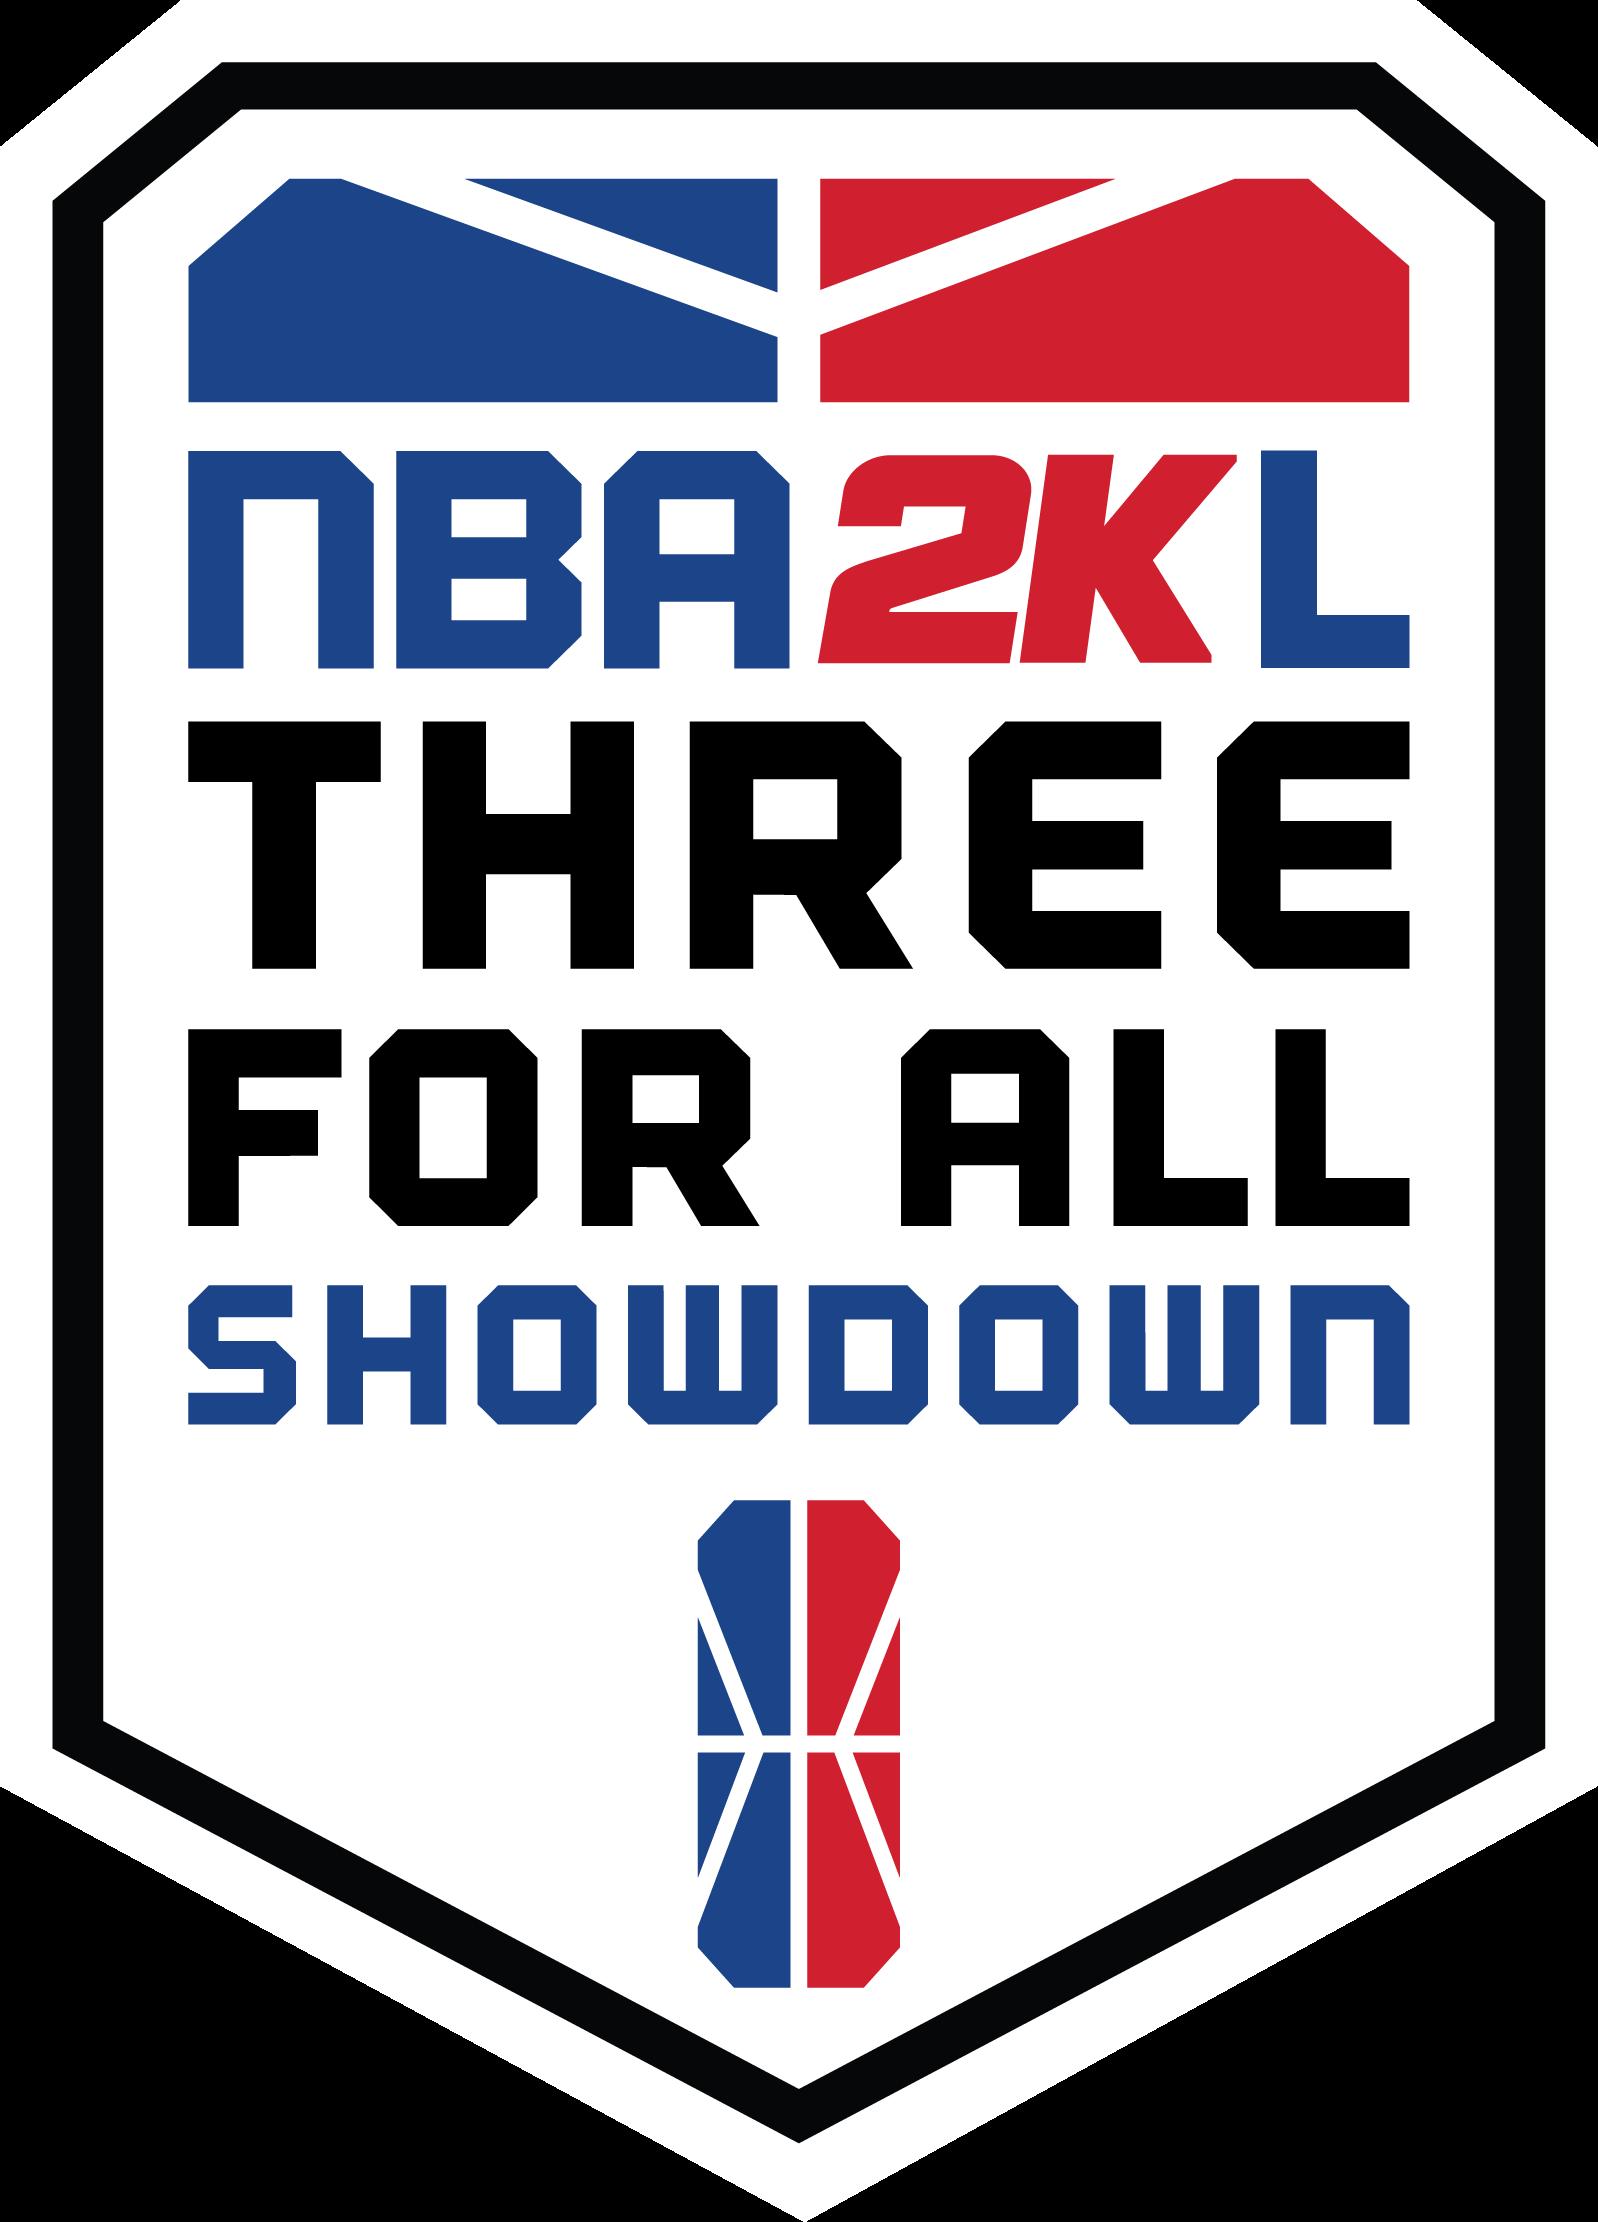 NBA_2K_League_Three For All Showdown full color